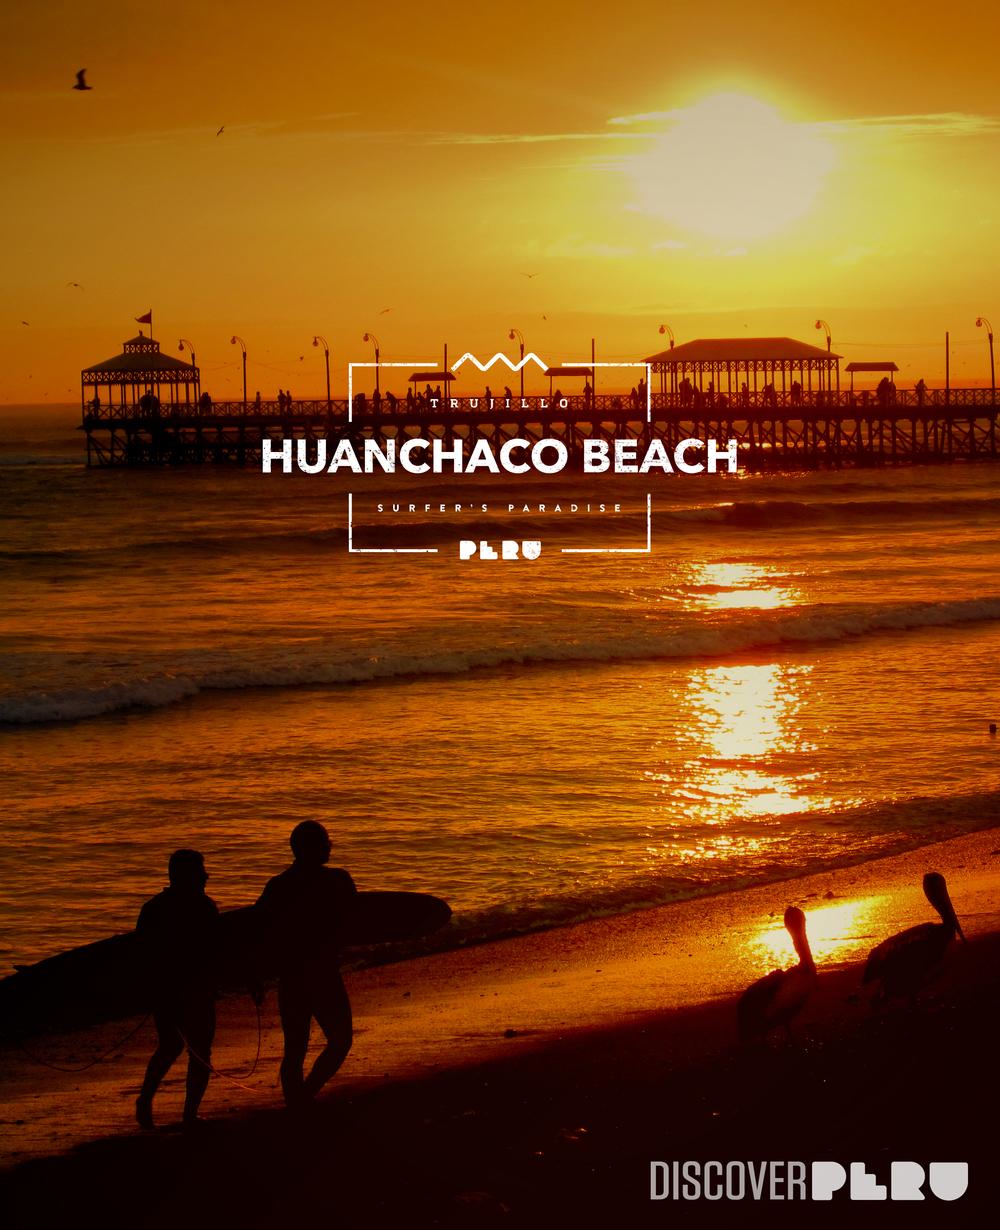 HuanchacoBeach.jpg